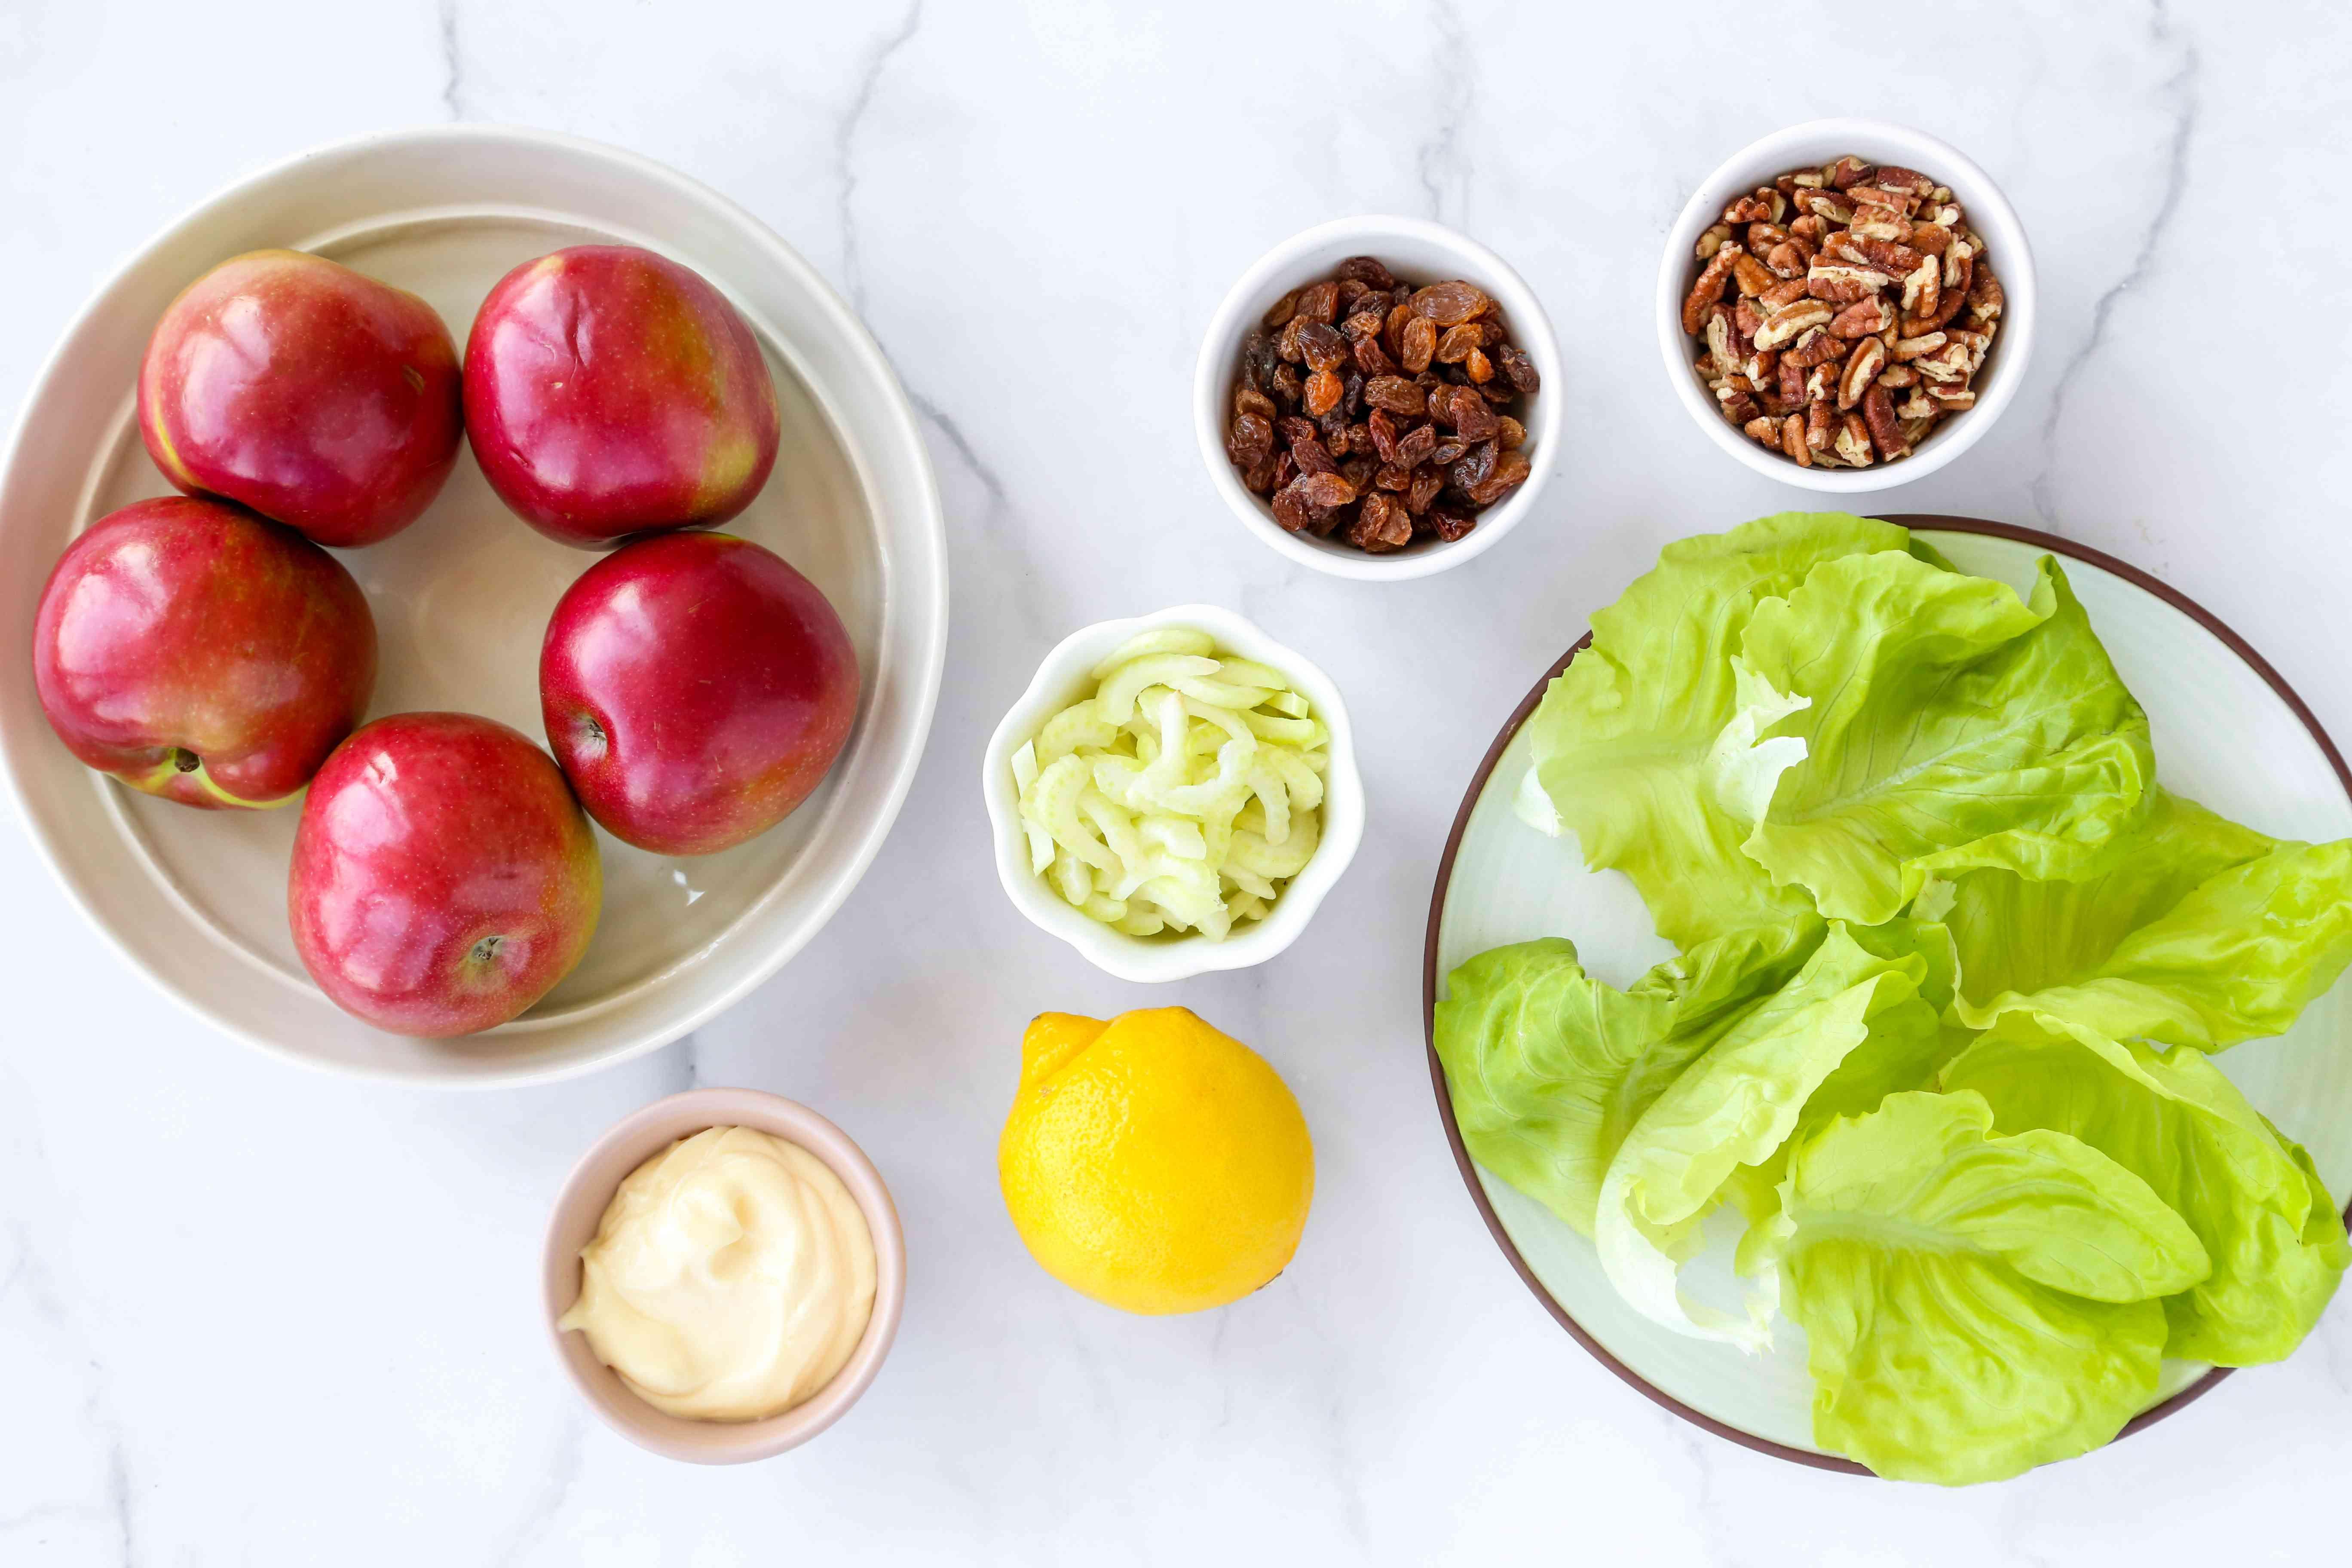 Ingredients for apple salad